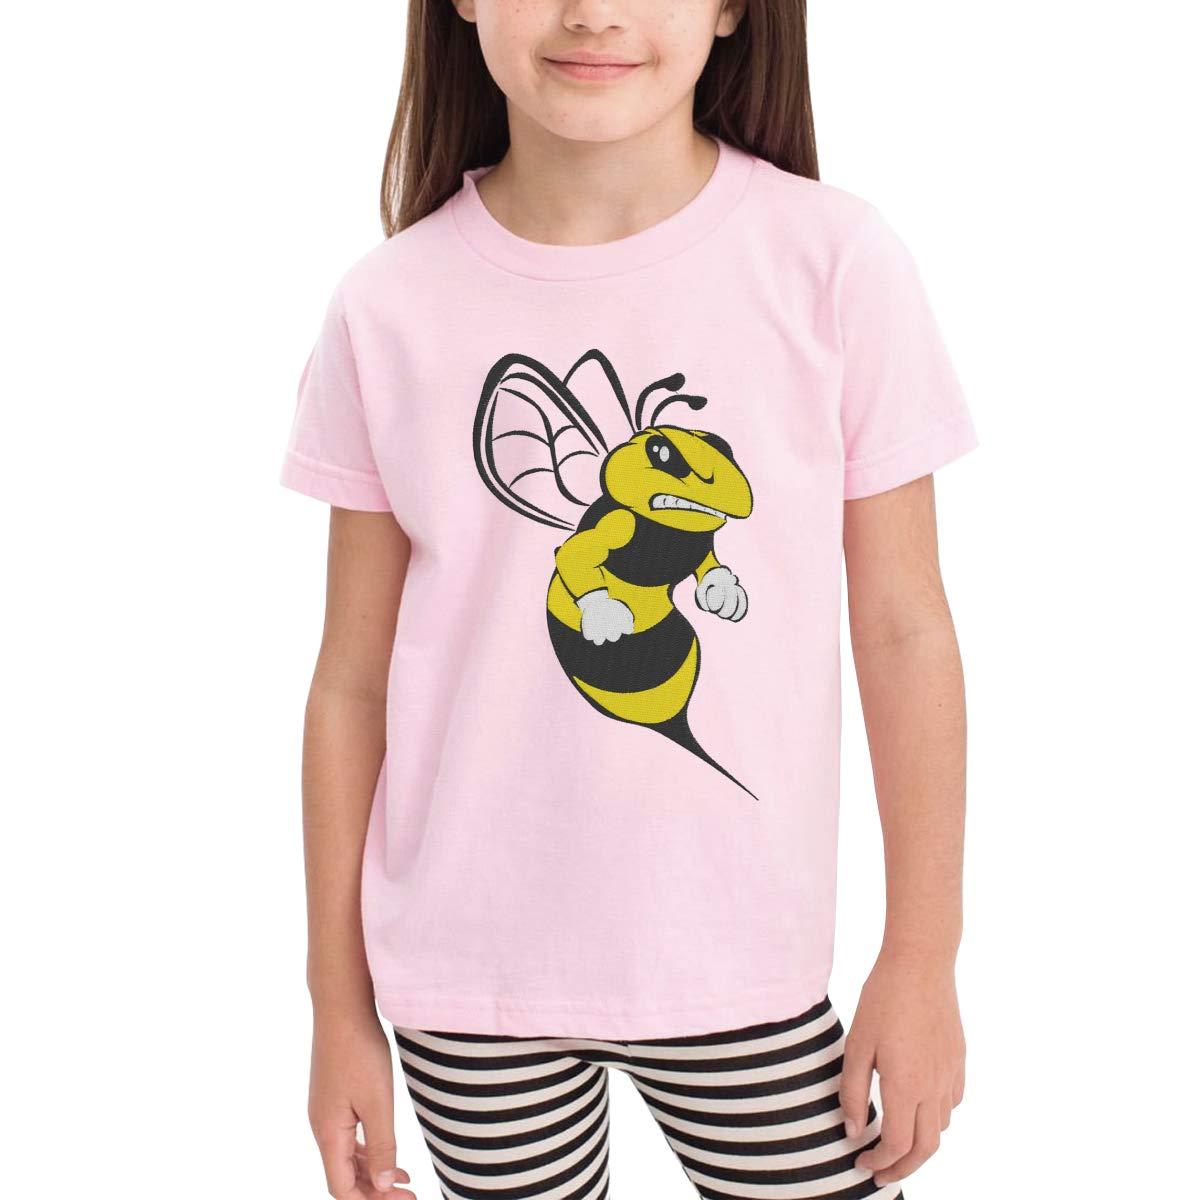 Onlybabycare Cart Cartoon Bumble Bee 100/% Cotton Toddler Baby Boys Girls Kids Short Sleeve T Shirt Top Tee Clothes 2-6 T